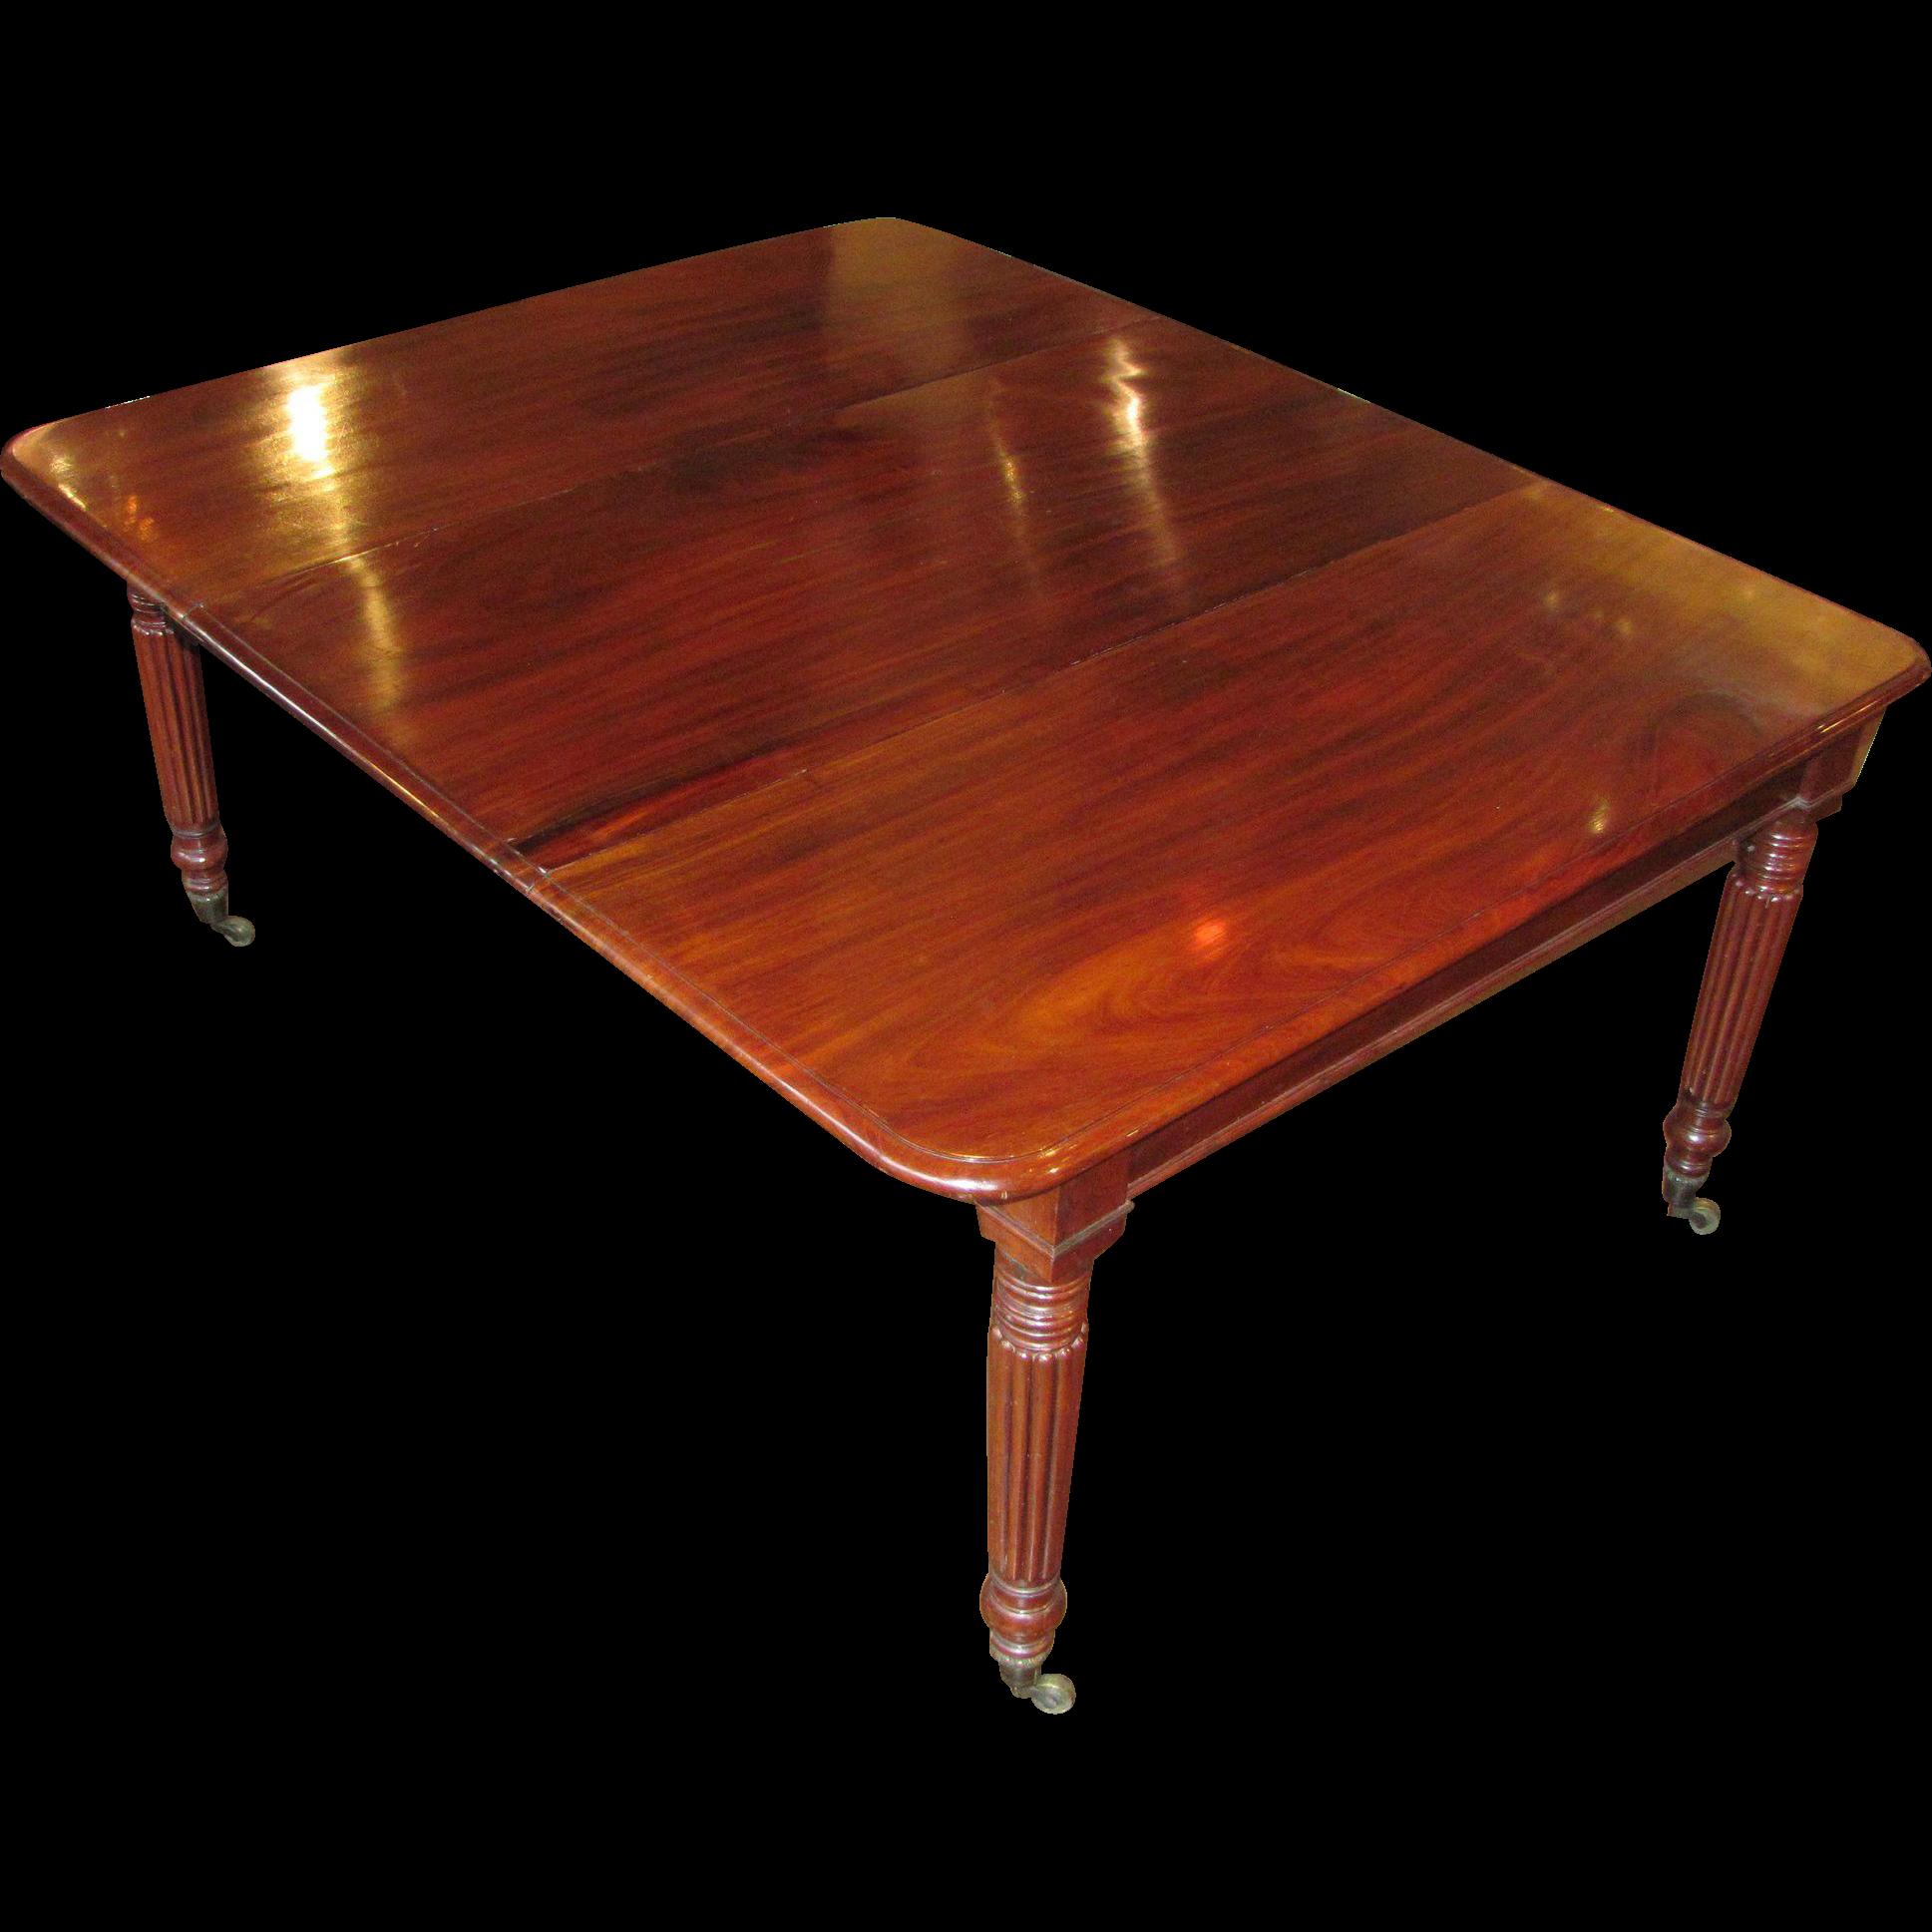 Antique English Sheraton Mahogany Dining Table Circa 1835